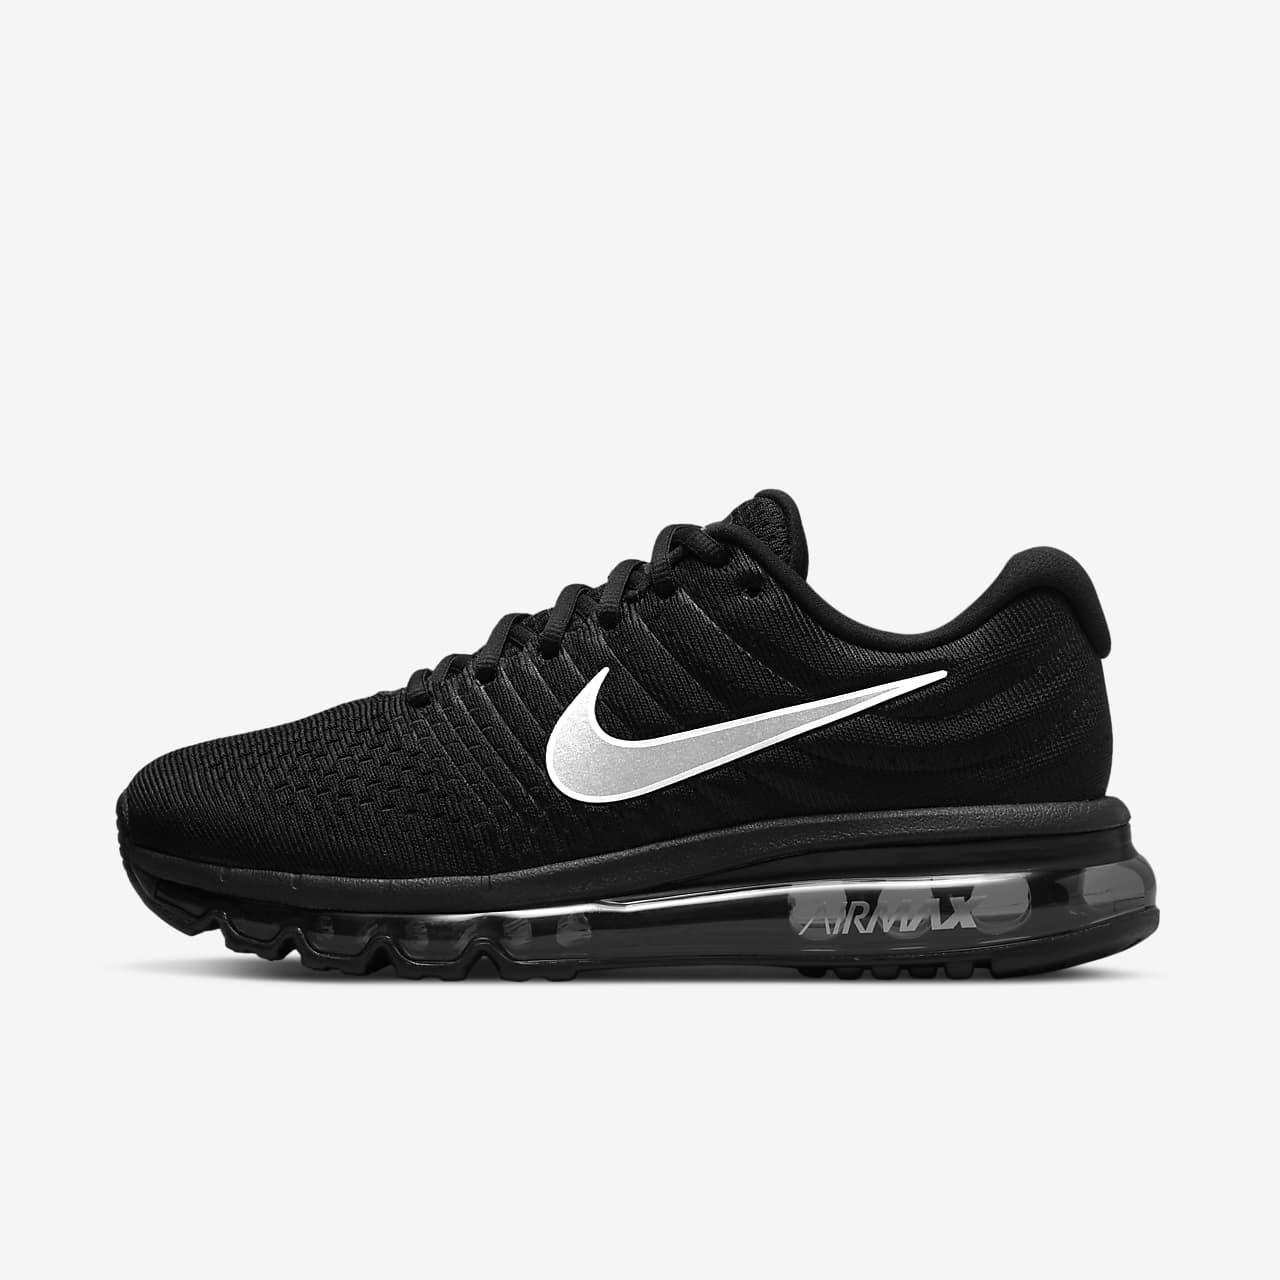 new styles 113af a3592 ... Nike Air Max 2017 sko til dame